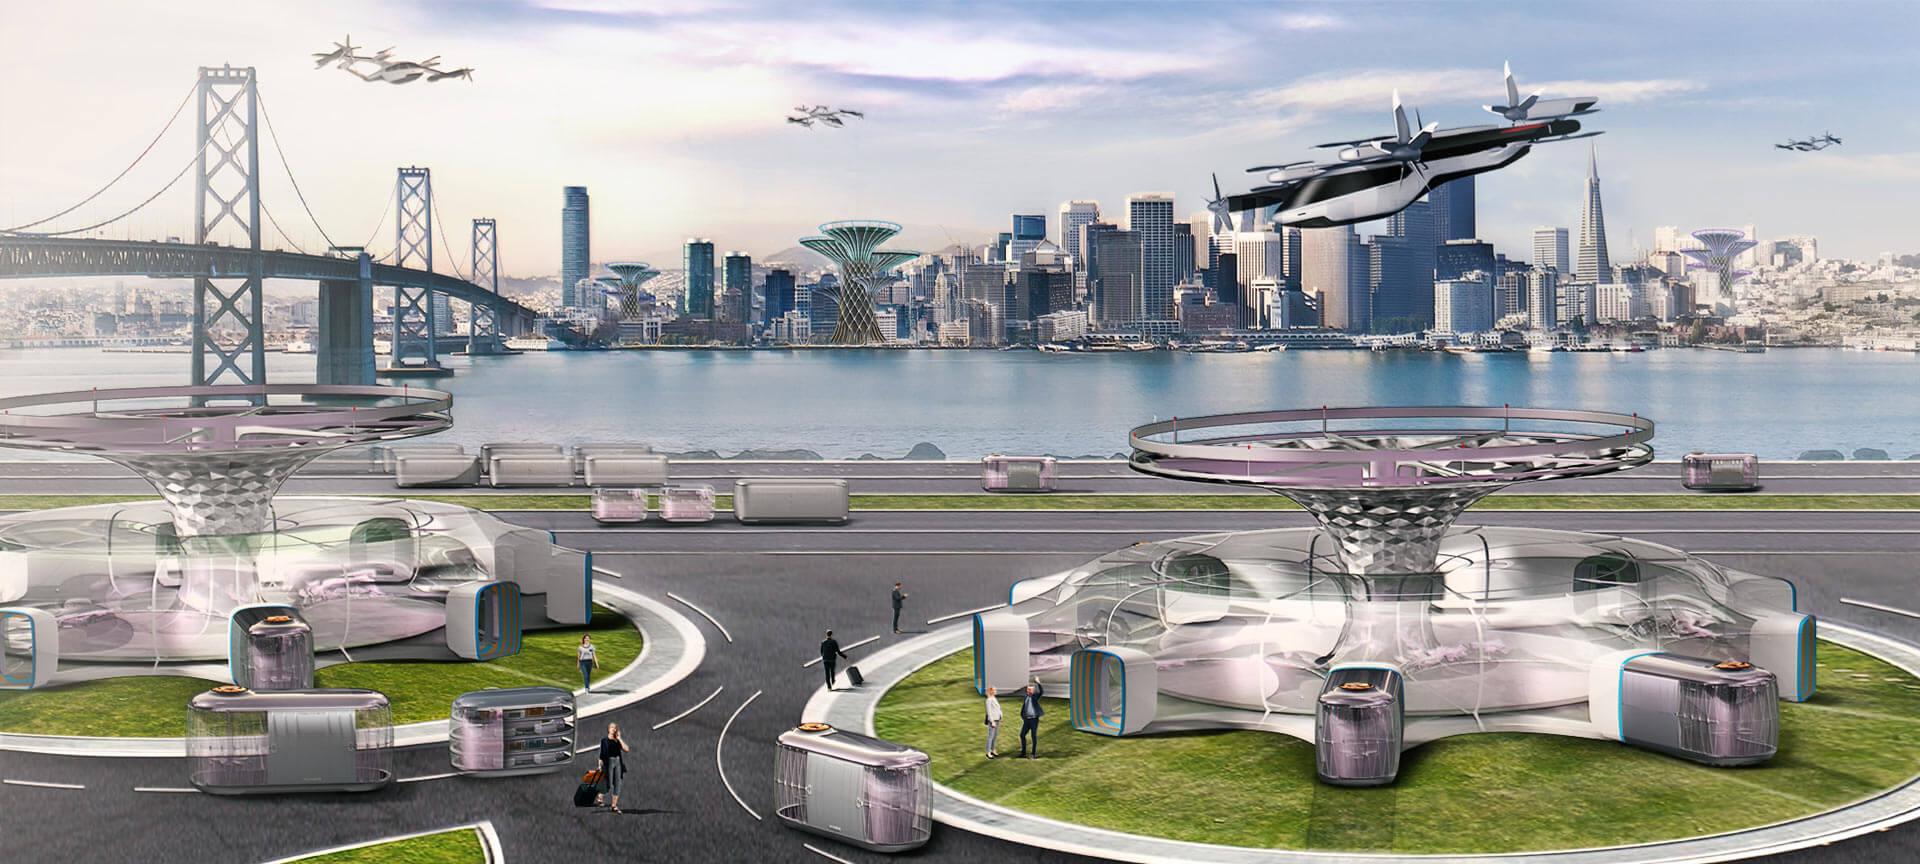 hyundai ces 2020 personal flying car